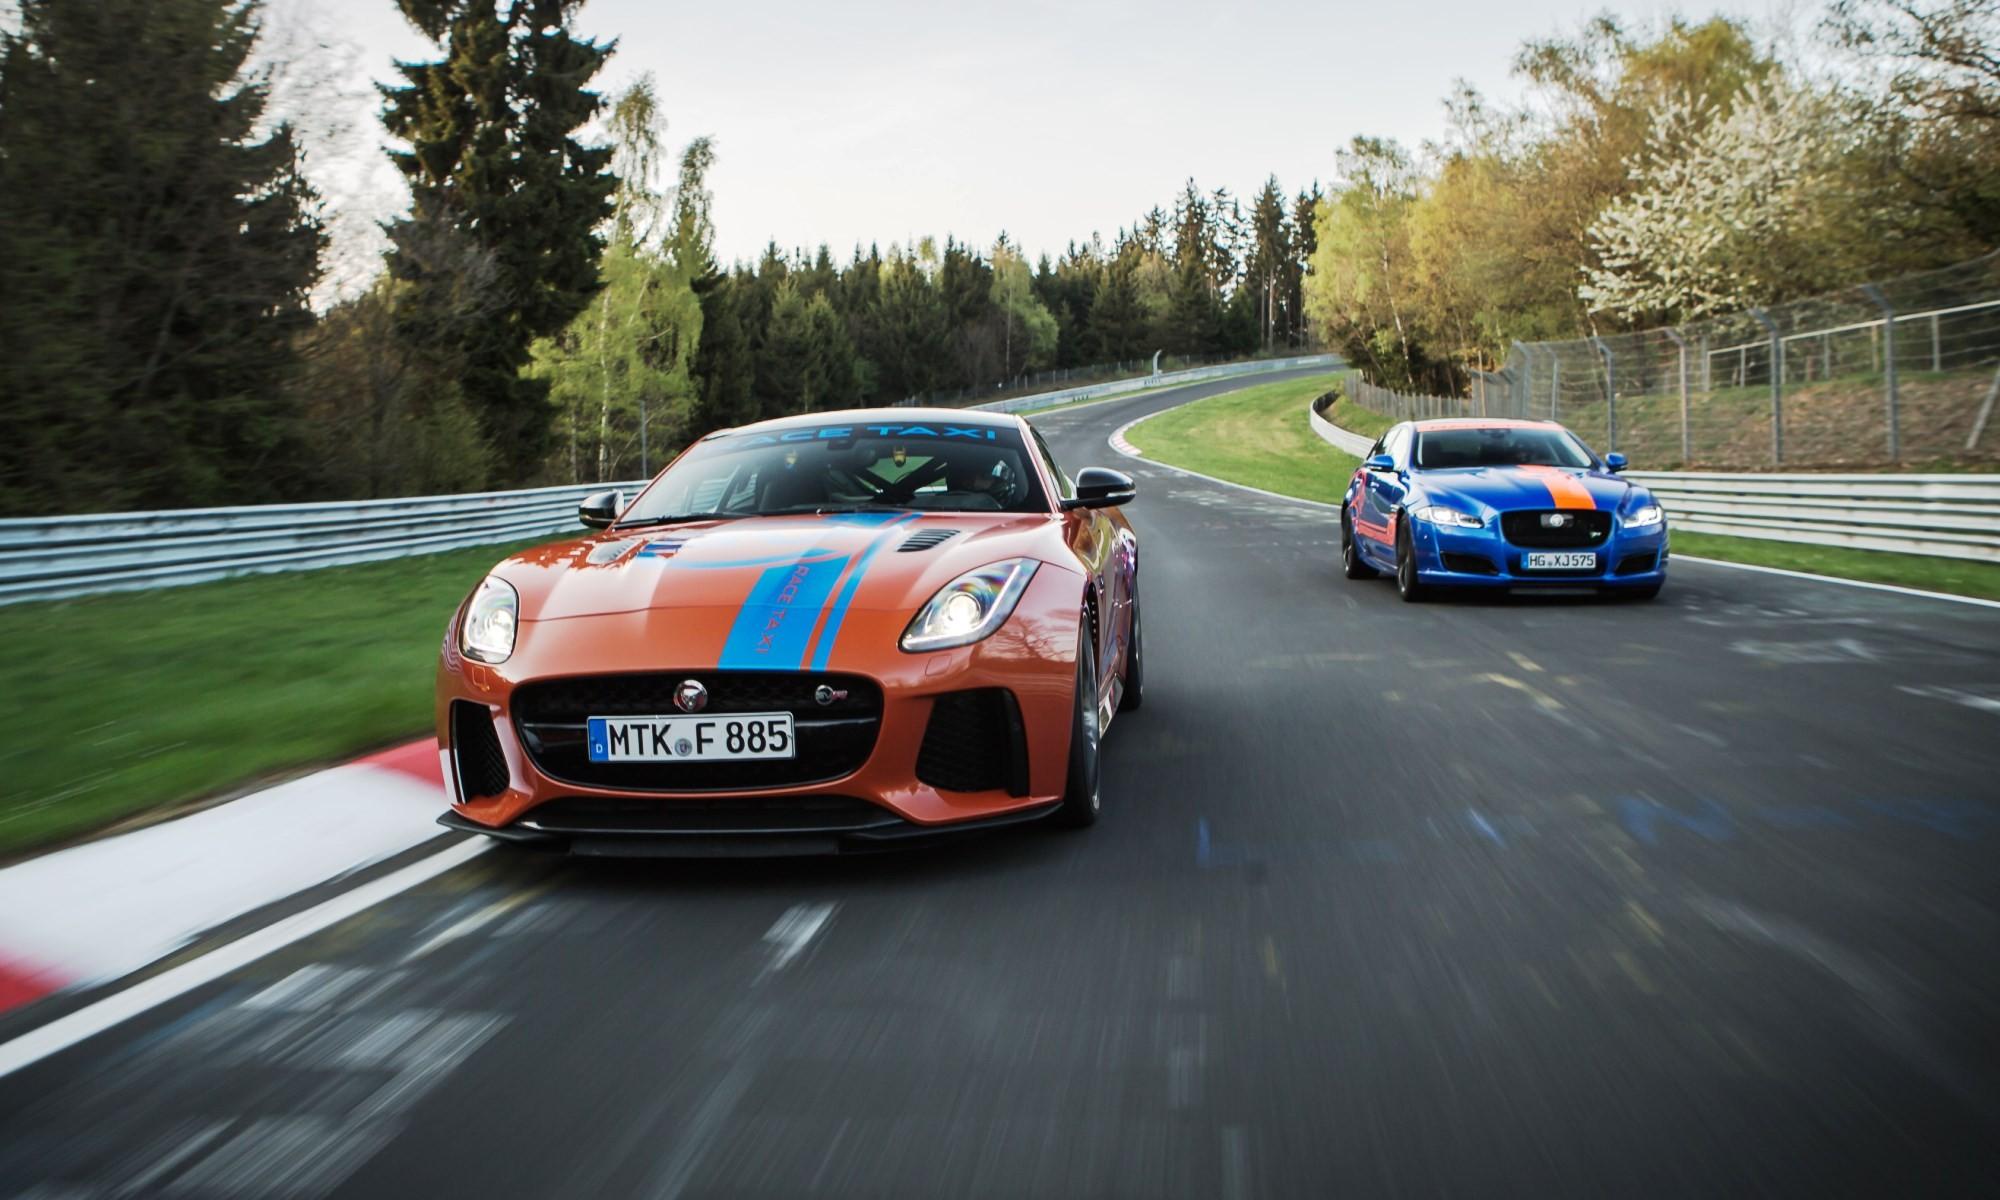 Jaguar Taxi Rides at Nurburgring